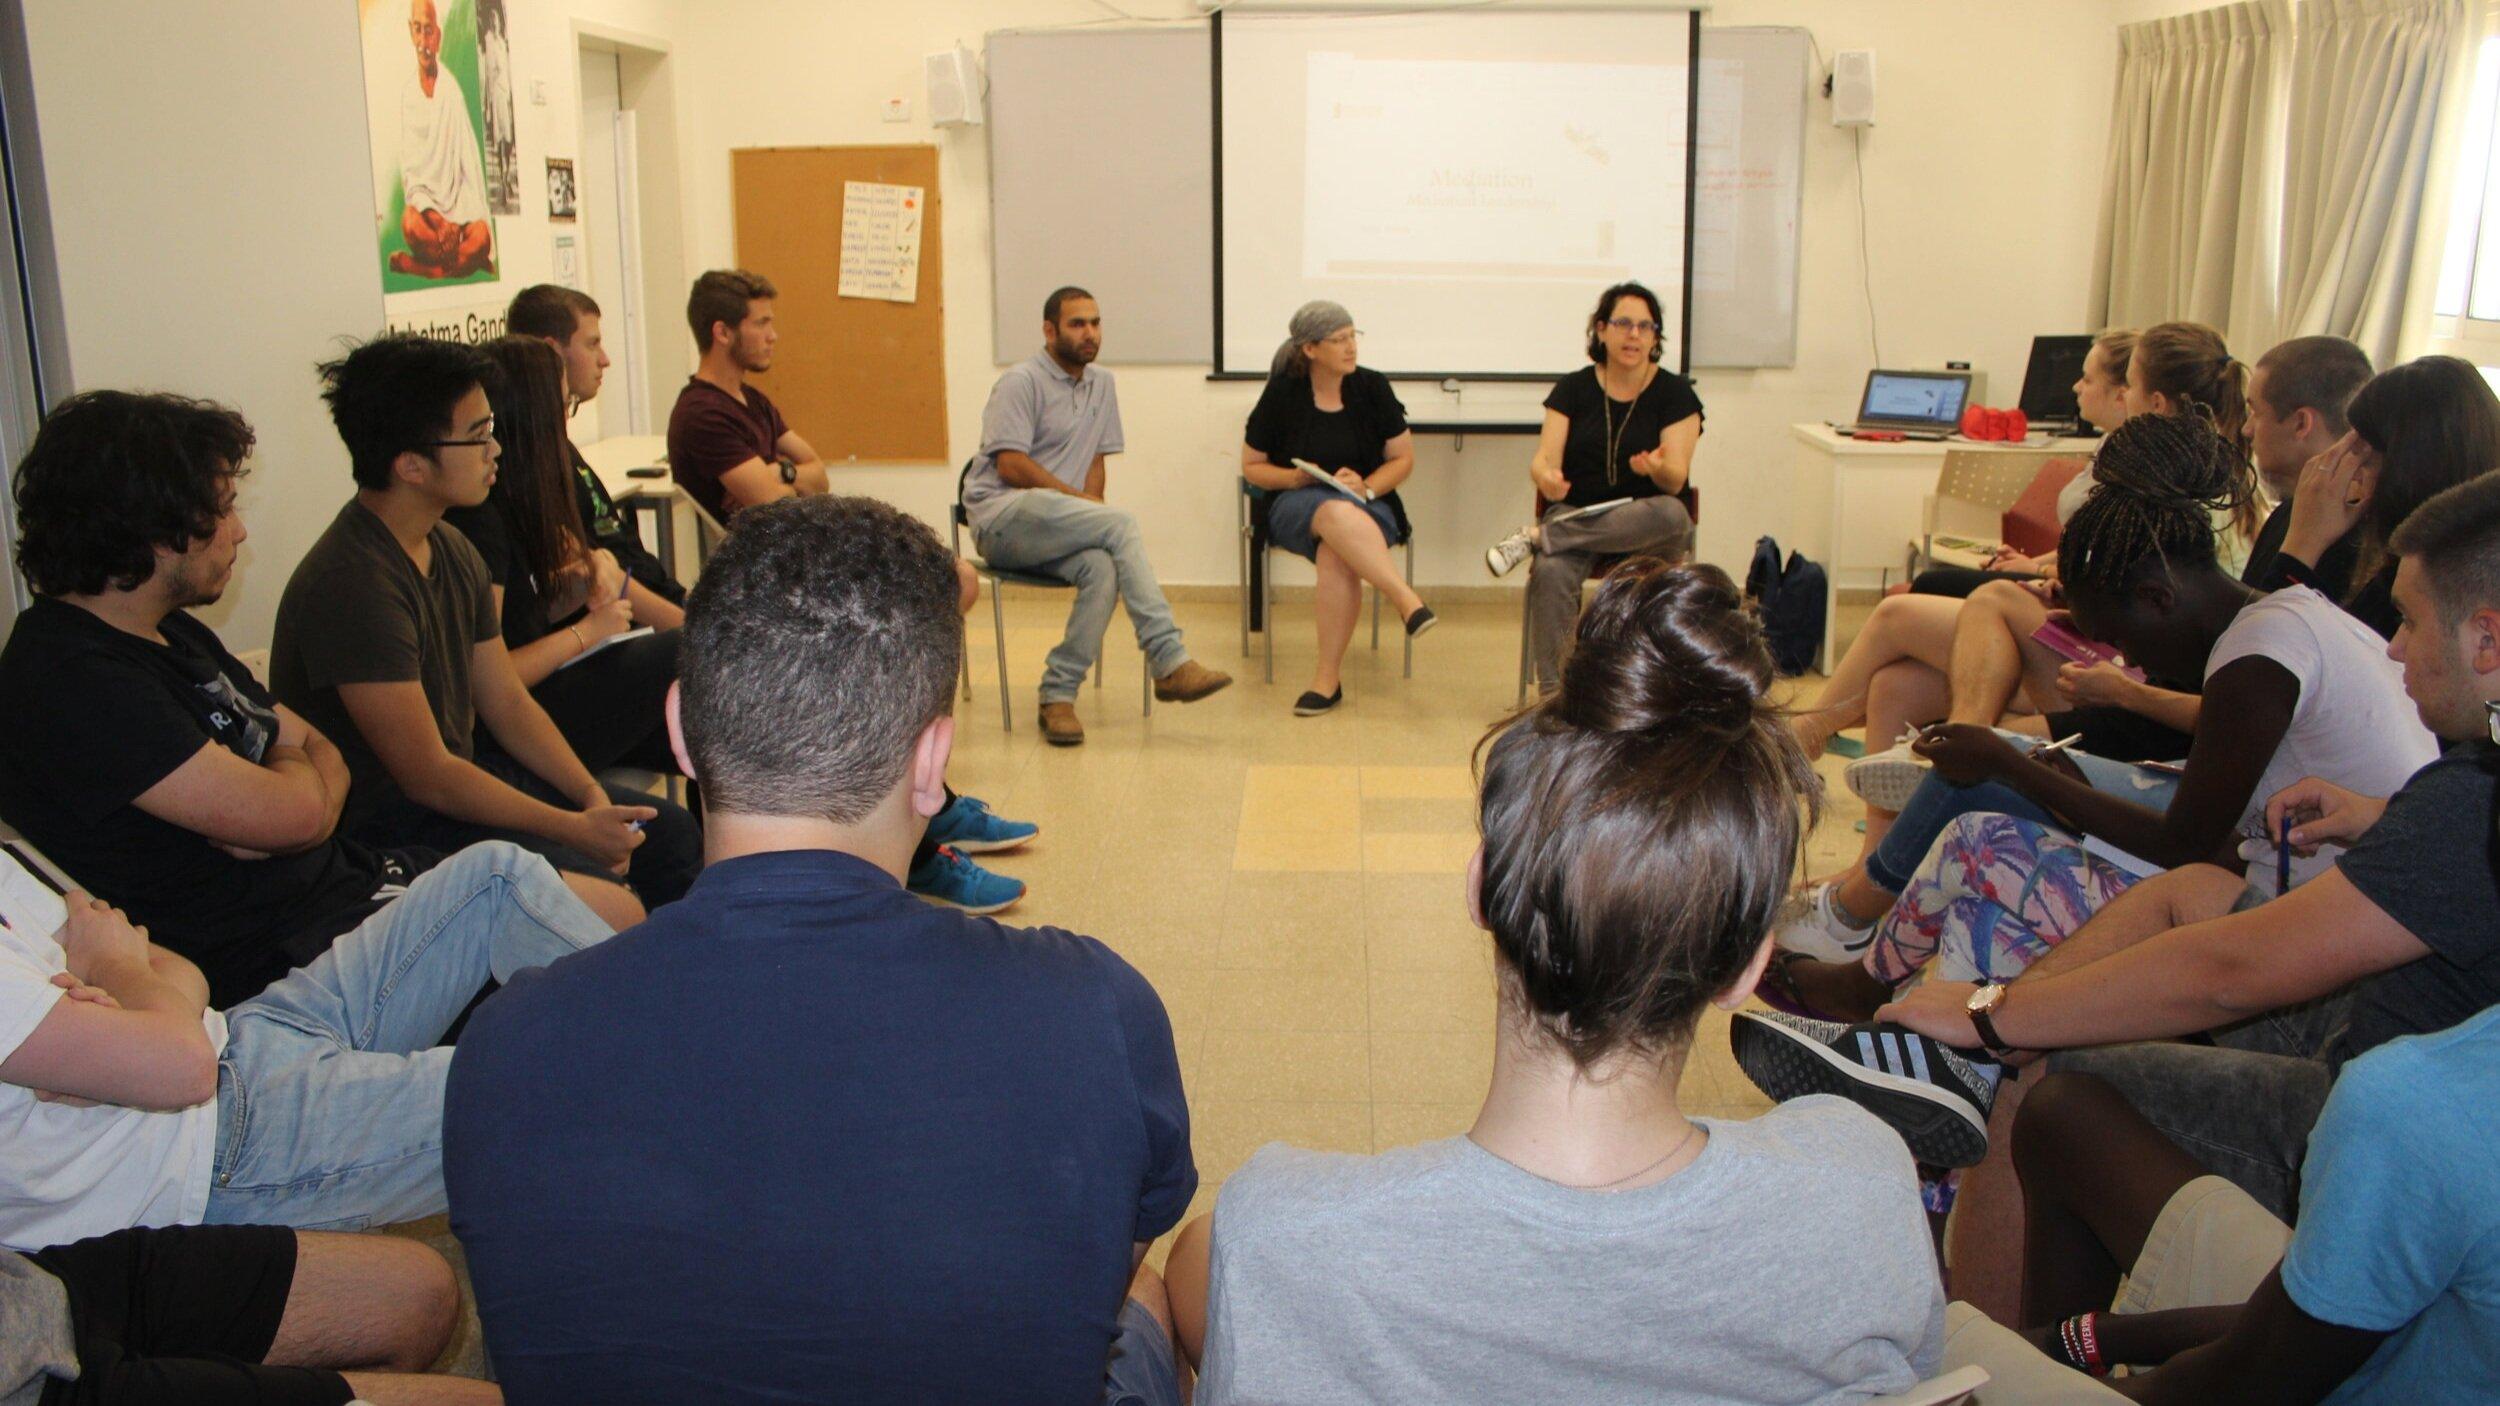 Ben Dvash, Hakfar Hayarok head of boarding school, Tzurit Yehuda, mediation facilitator, Michal Atzmon, CRC director, with the first cohort of our mediators!